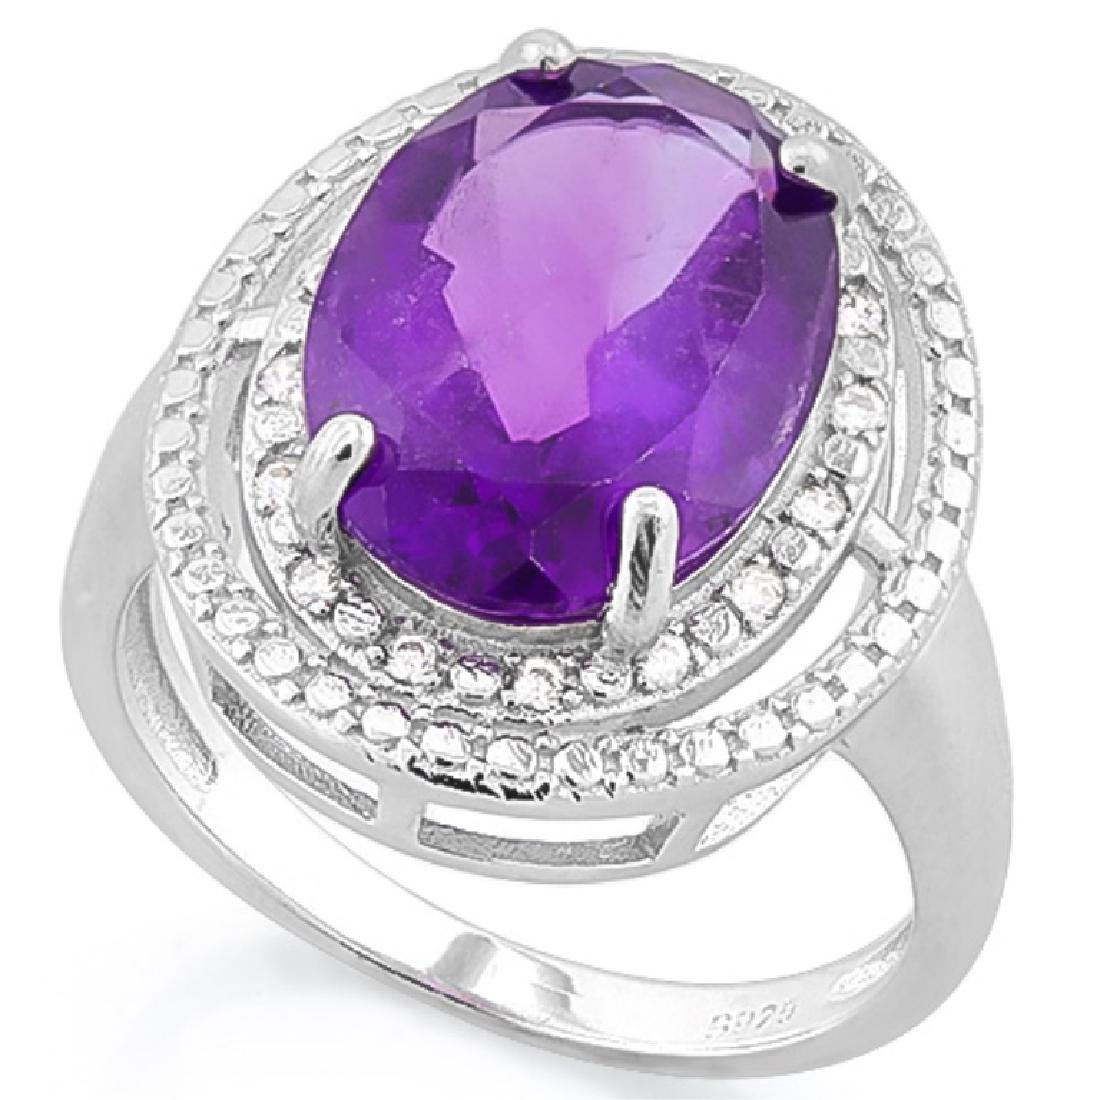 SPLENDID 5CT DEEP LAVENDAR AMETHYST/DIAMOND RING